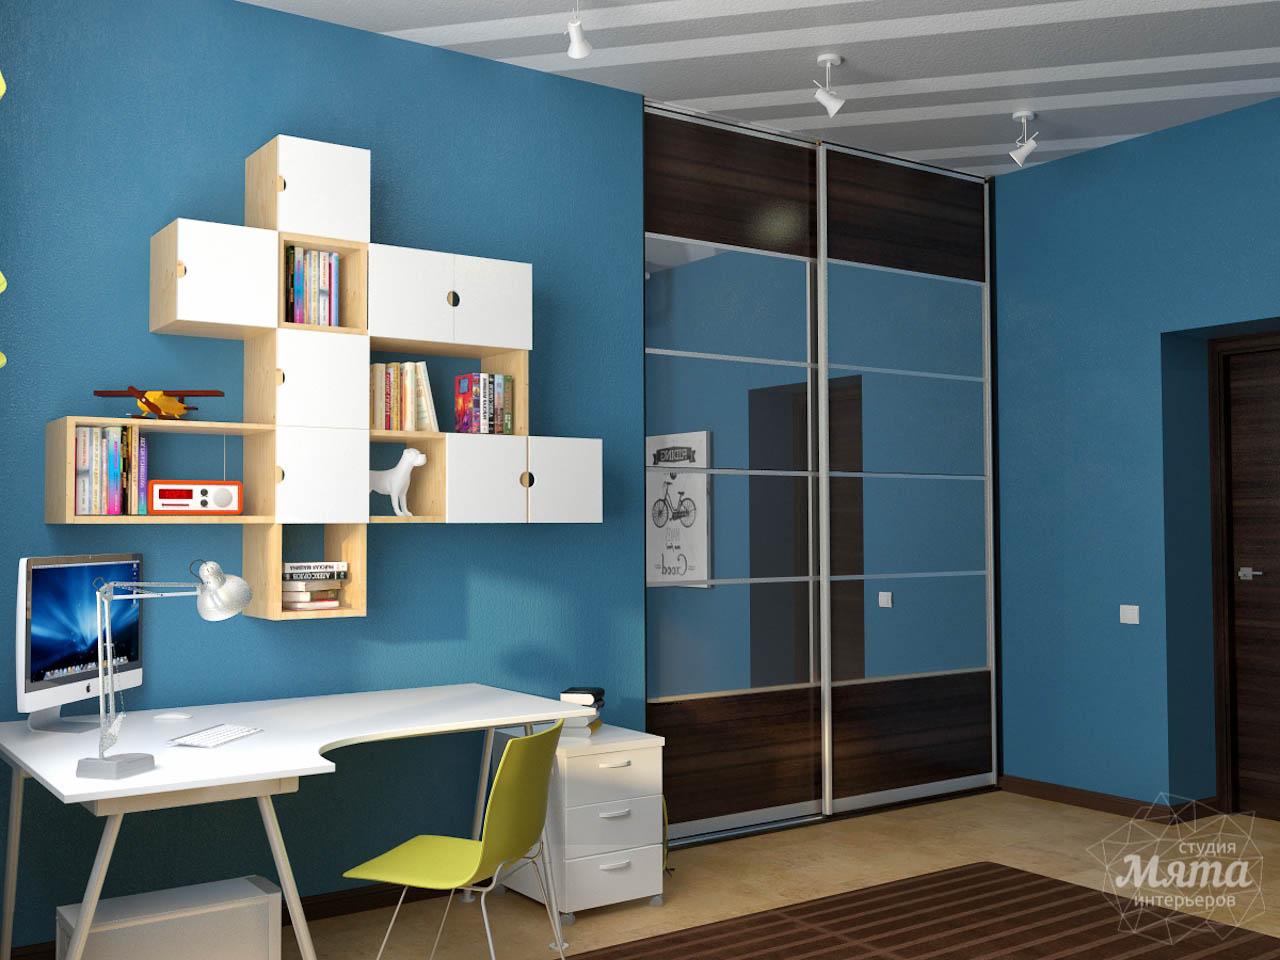 Дизайн проект интерьера коттеджа  в стиле минимализм по ул. Барвинка 15 img1075132103